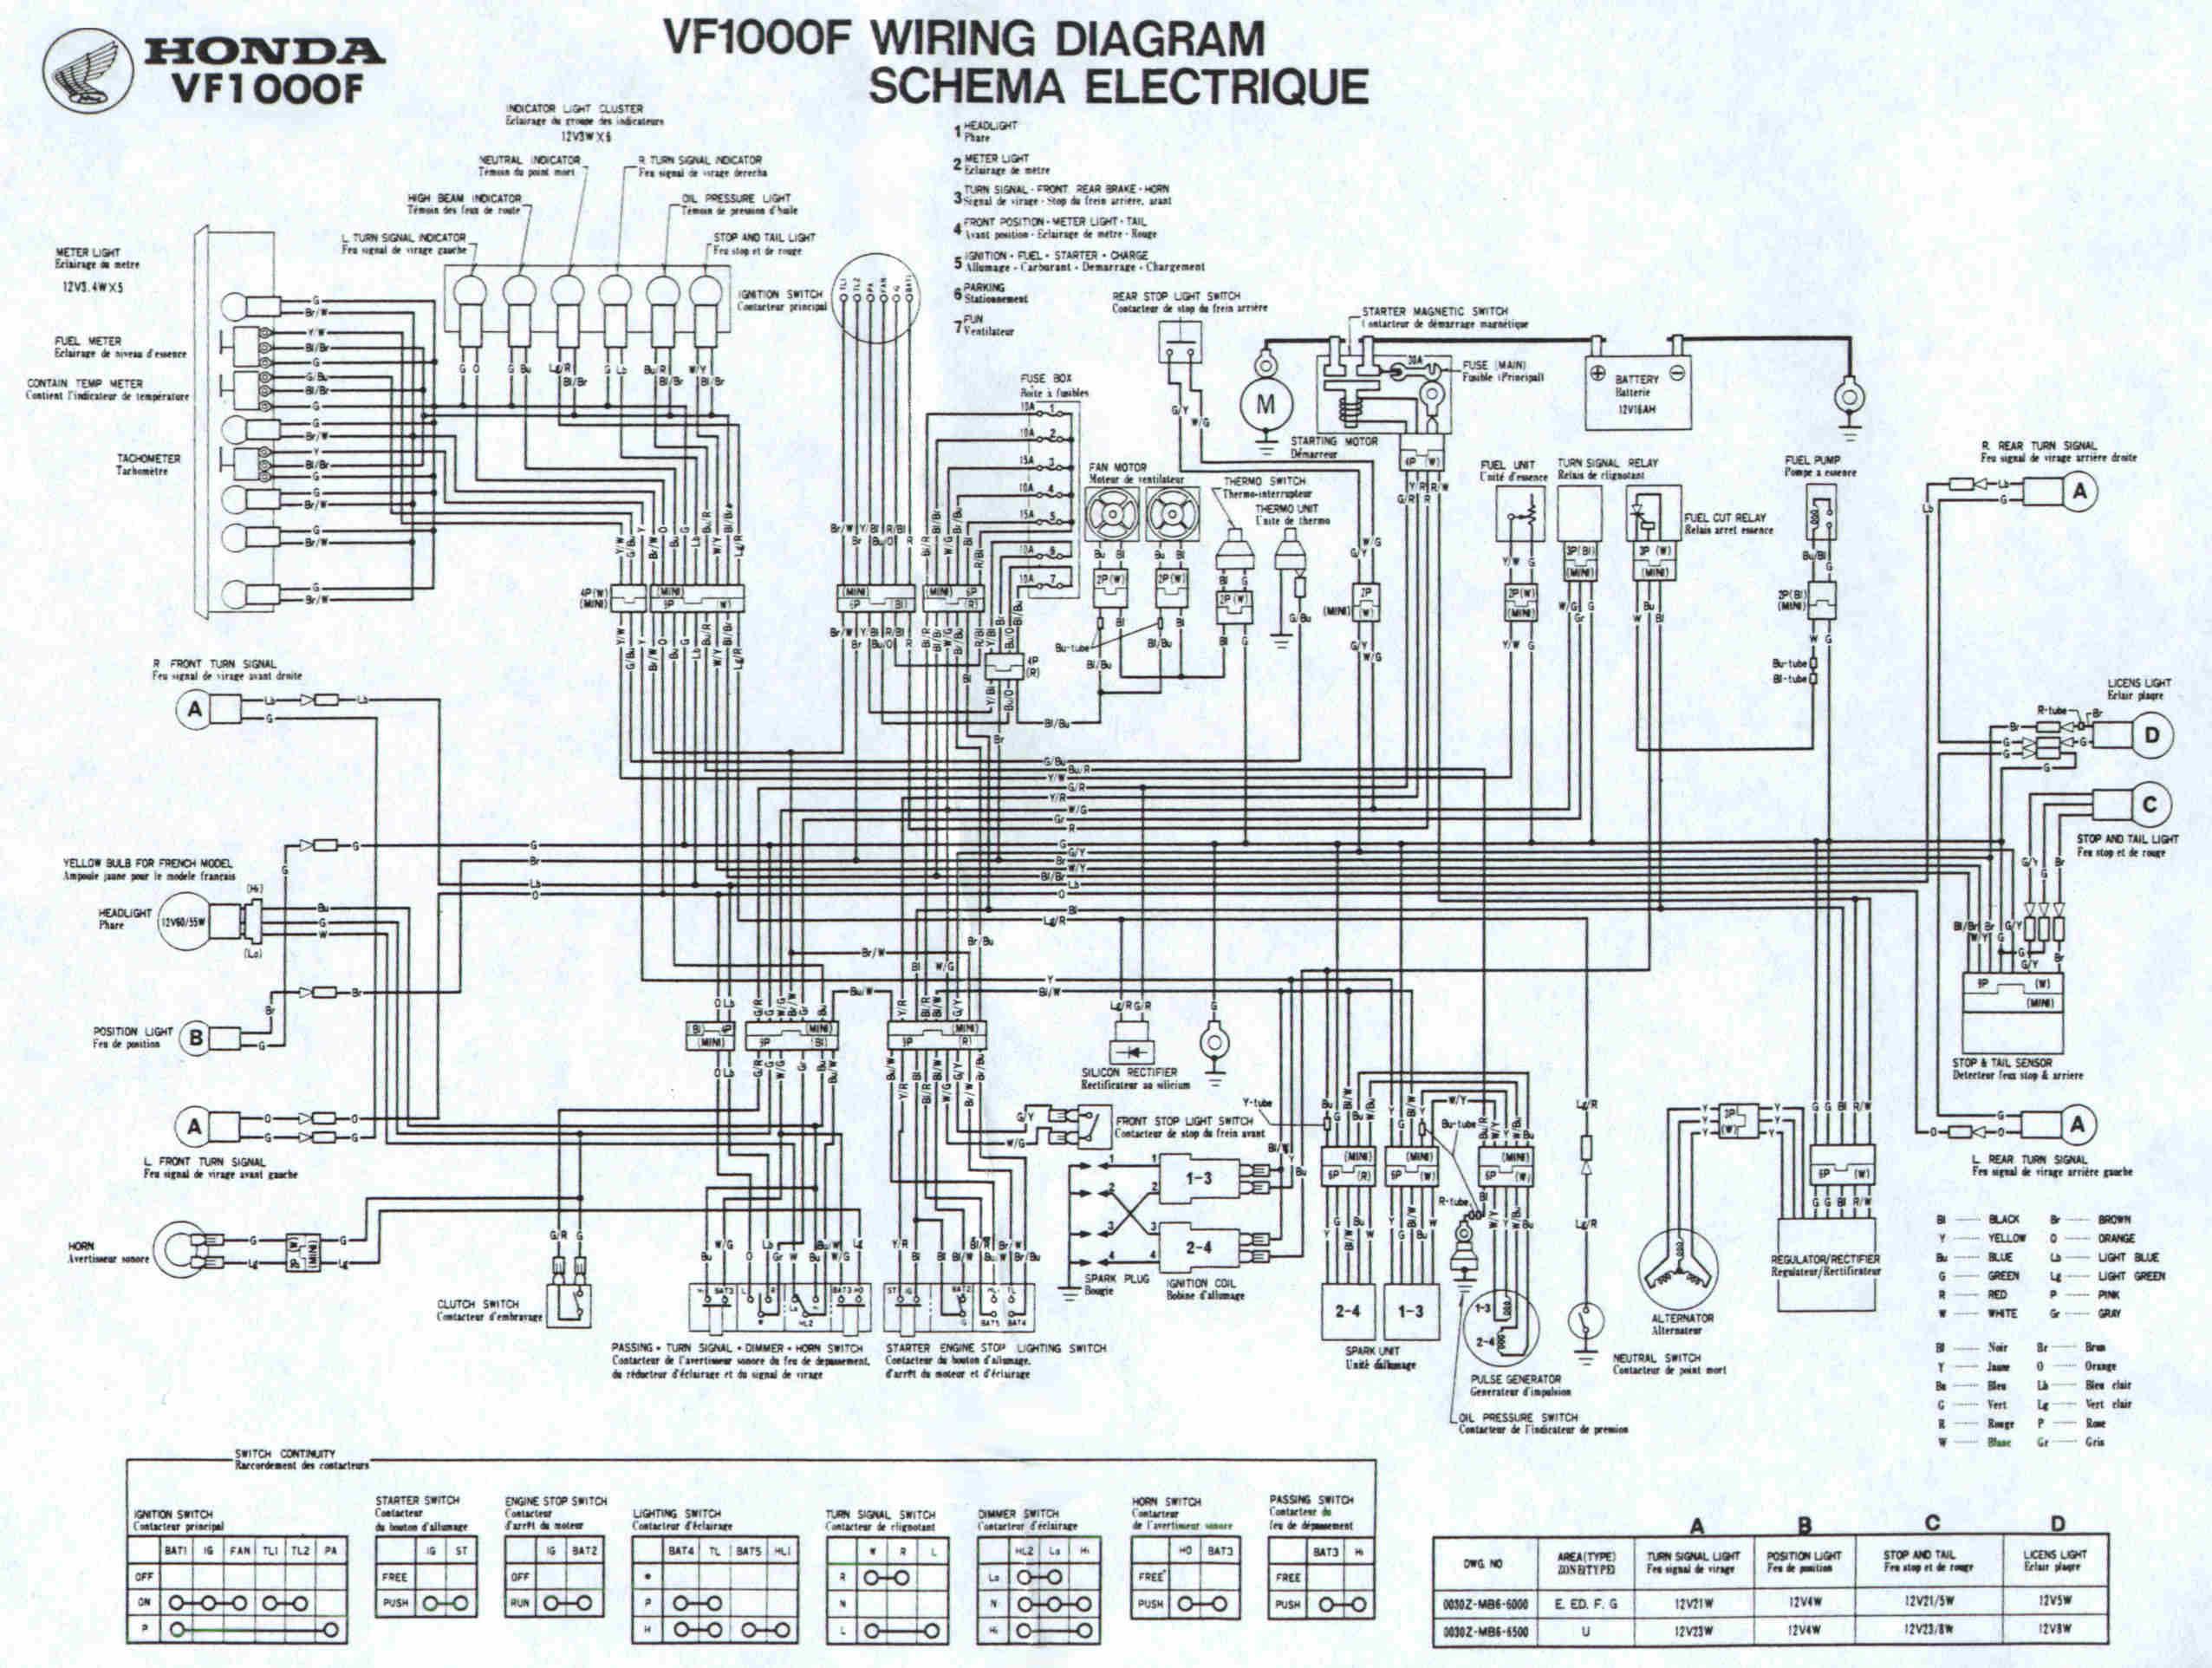 Kawasaki Bayou 220 Ignition Switch Wiring Diagram